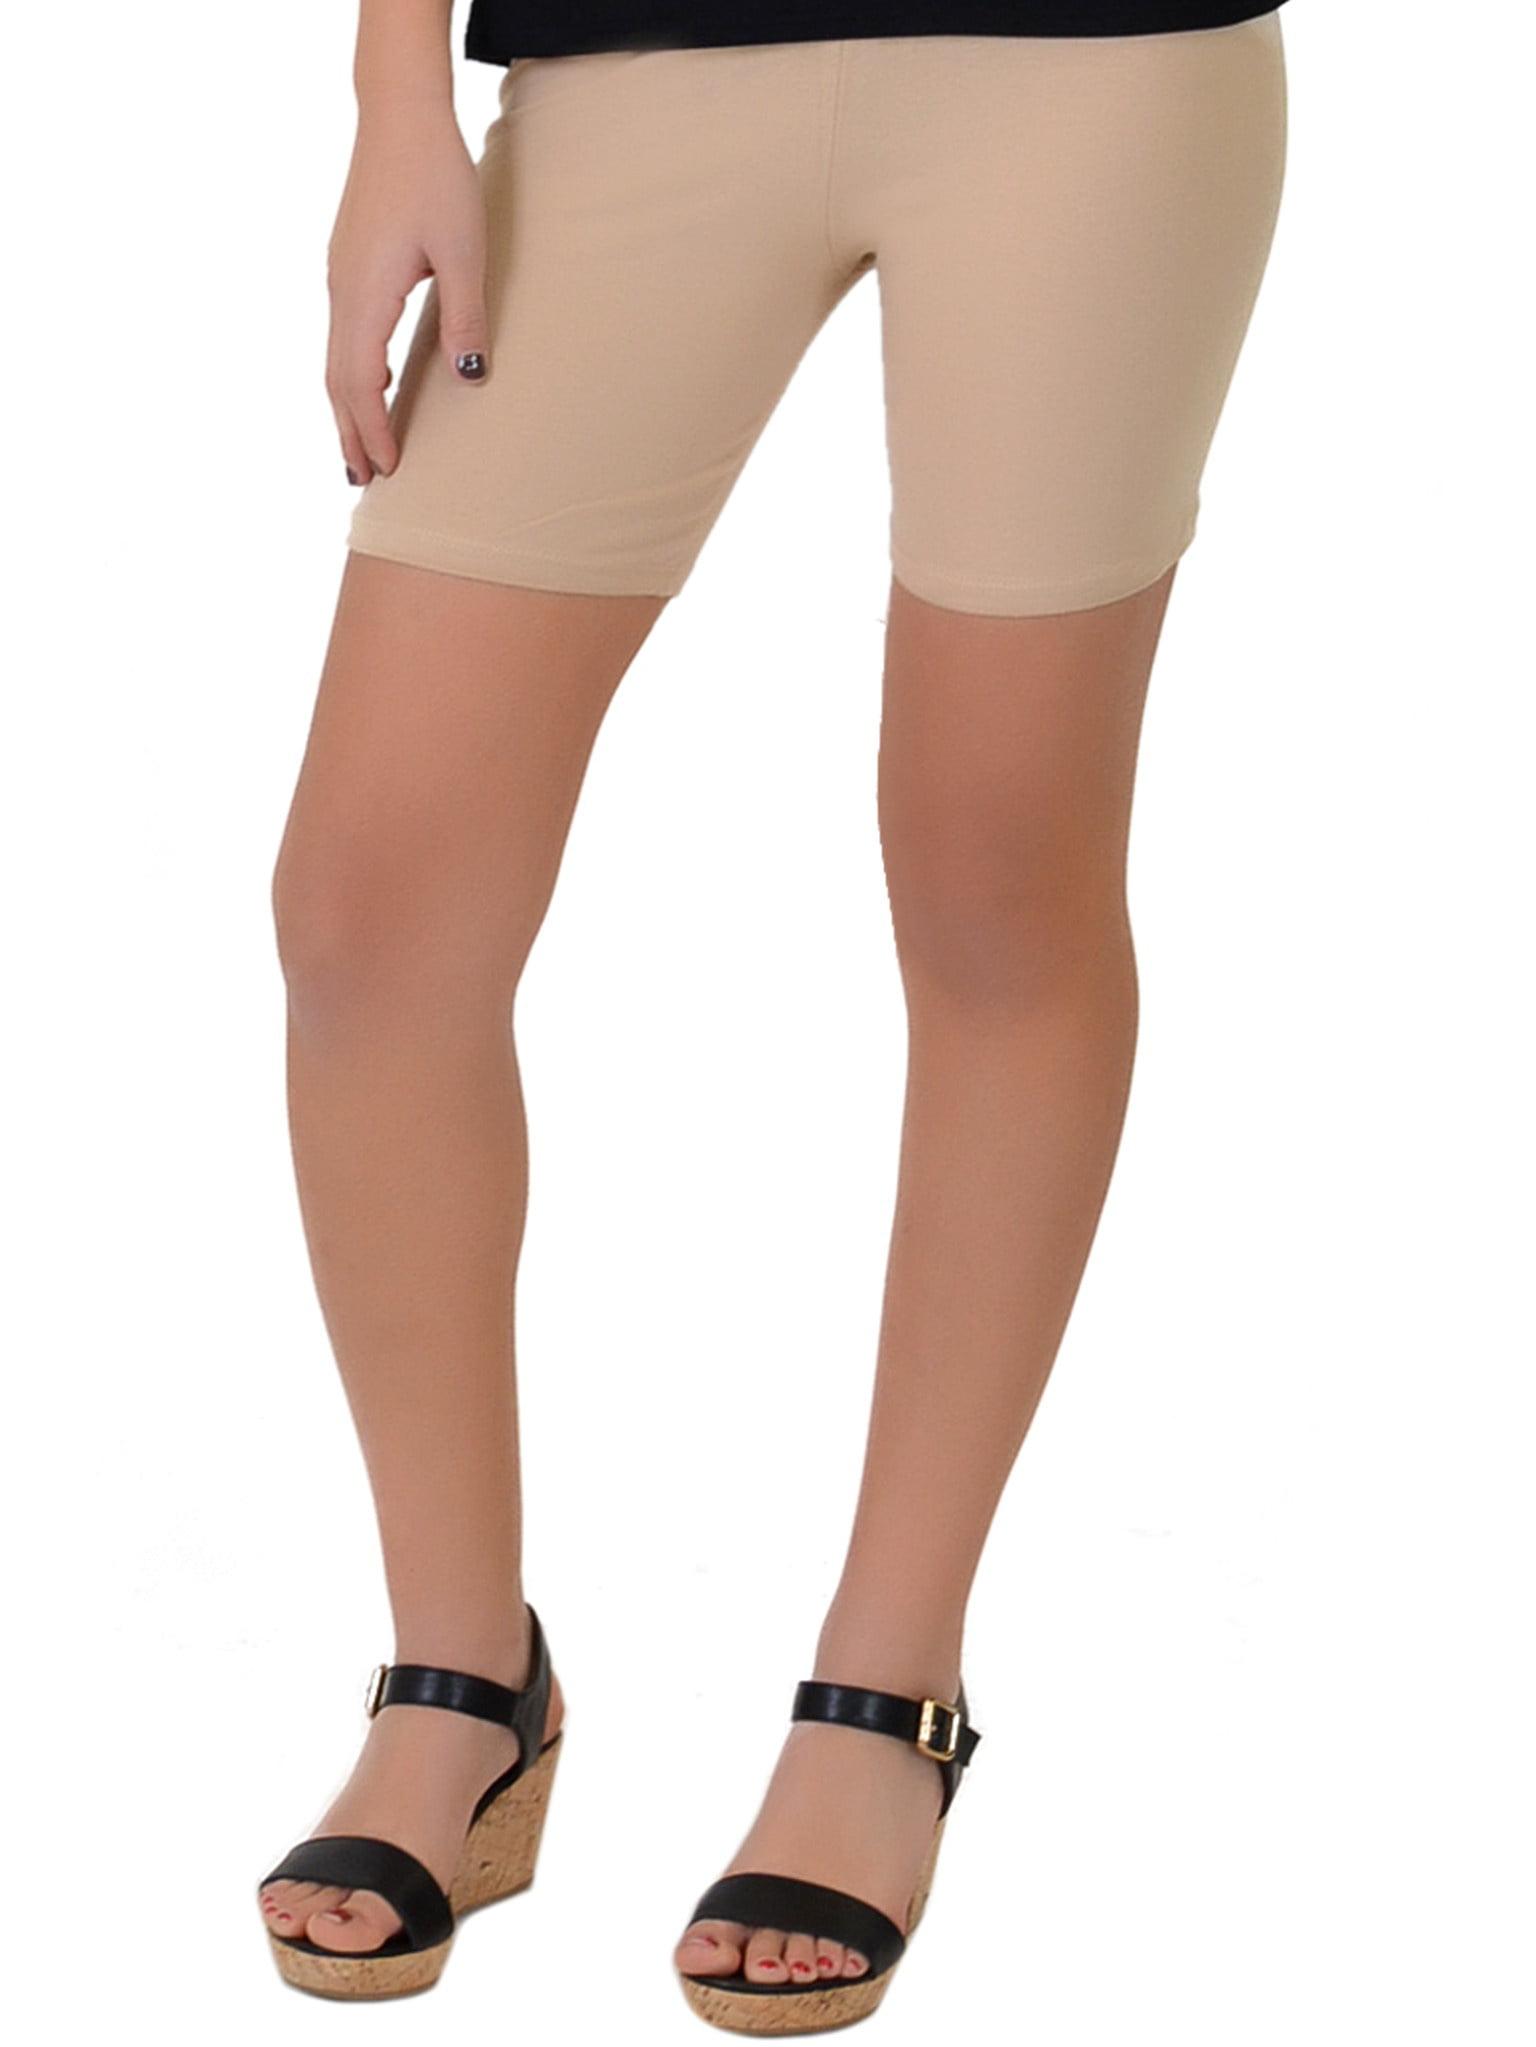 Women's Cotton Stretch Workout Bike Shorts - Large (8-10) / Beige